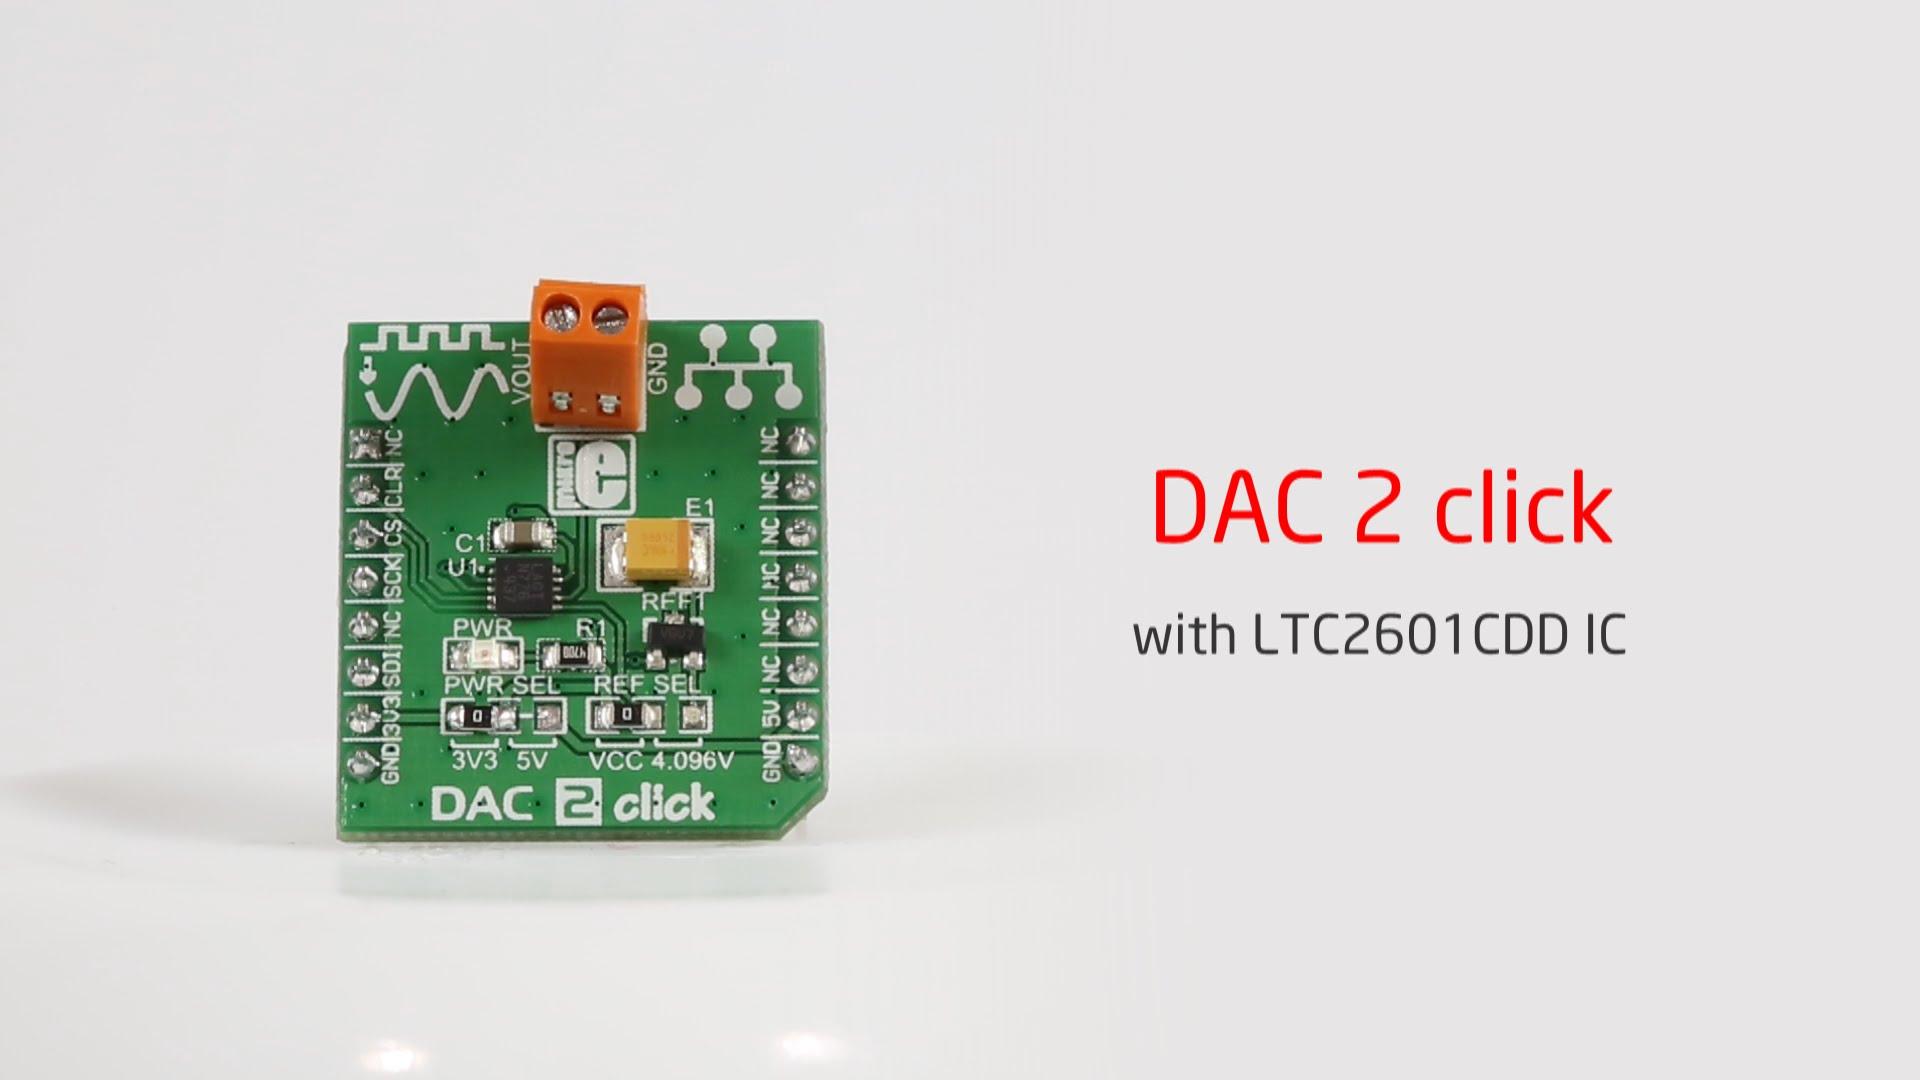 DAC2 click released